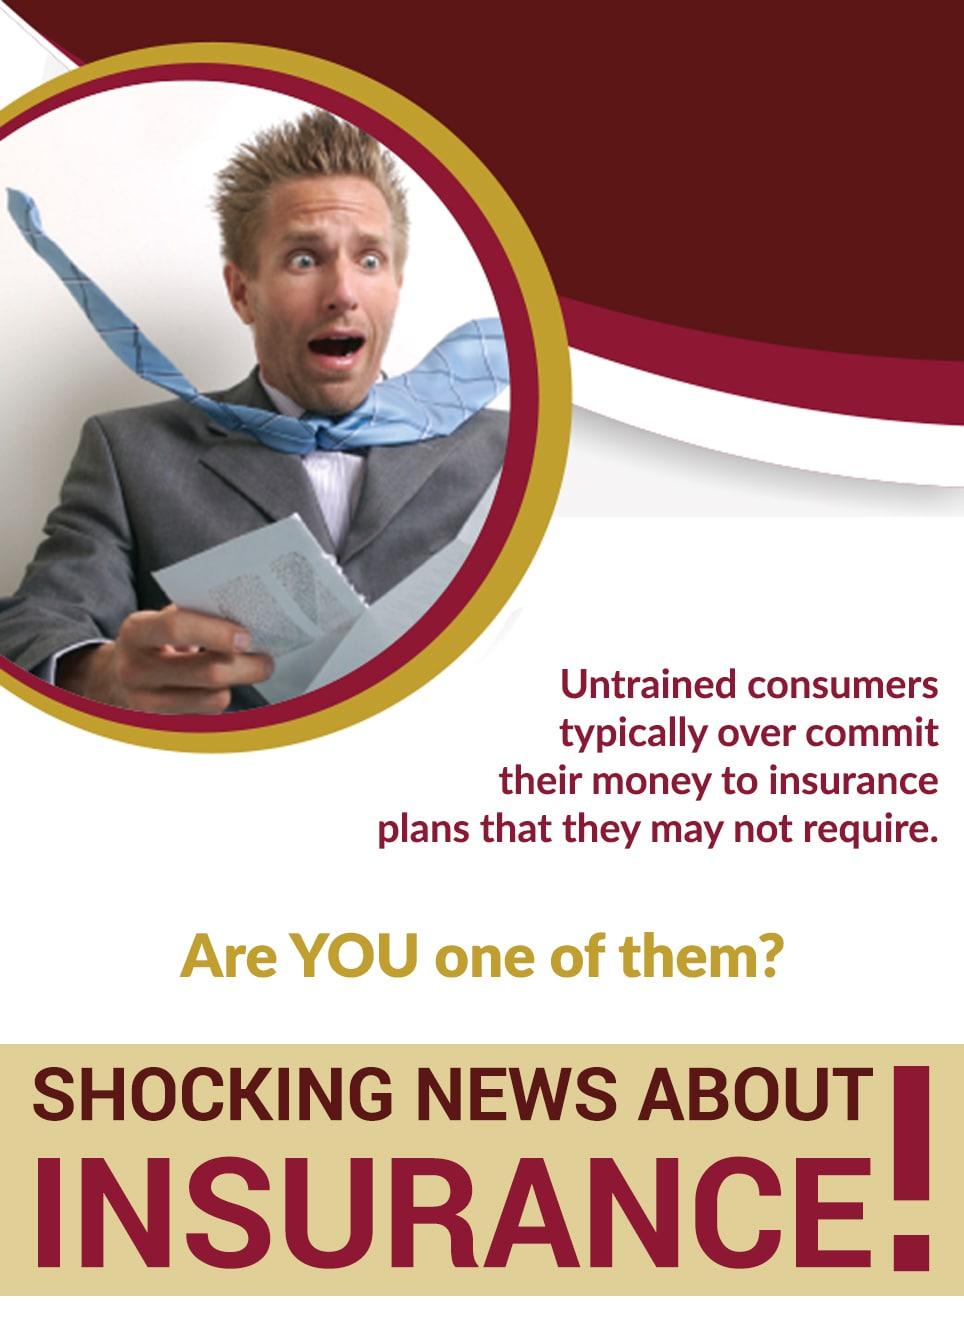 shocking news about insurance